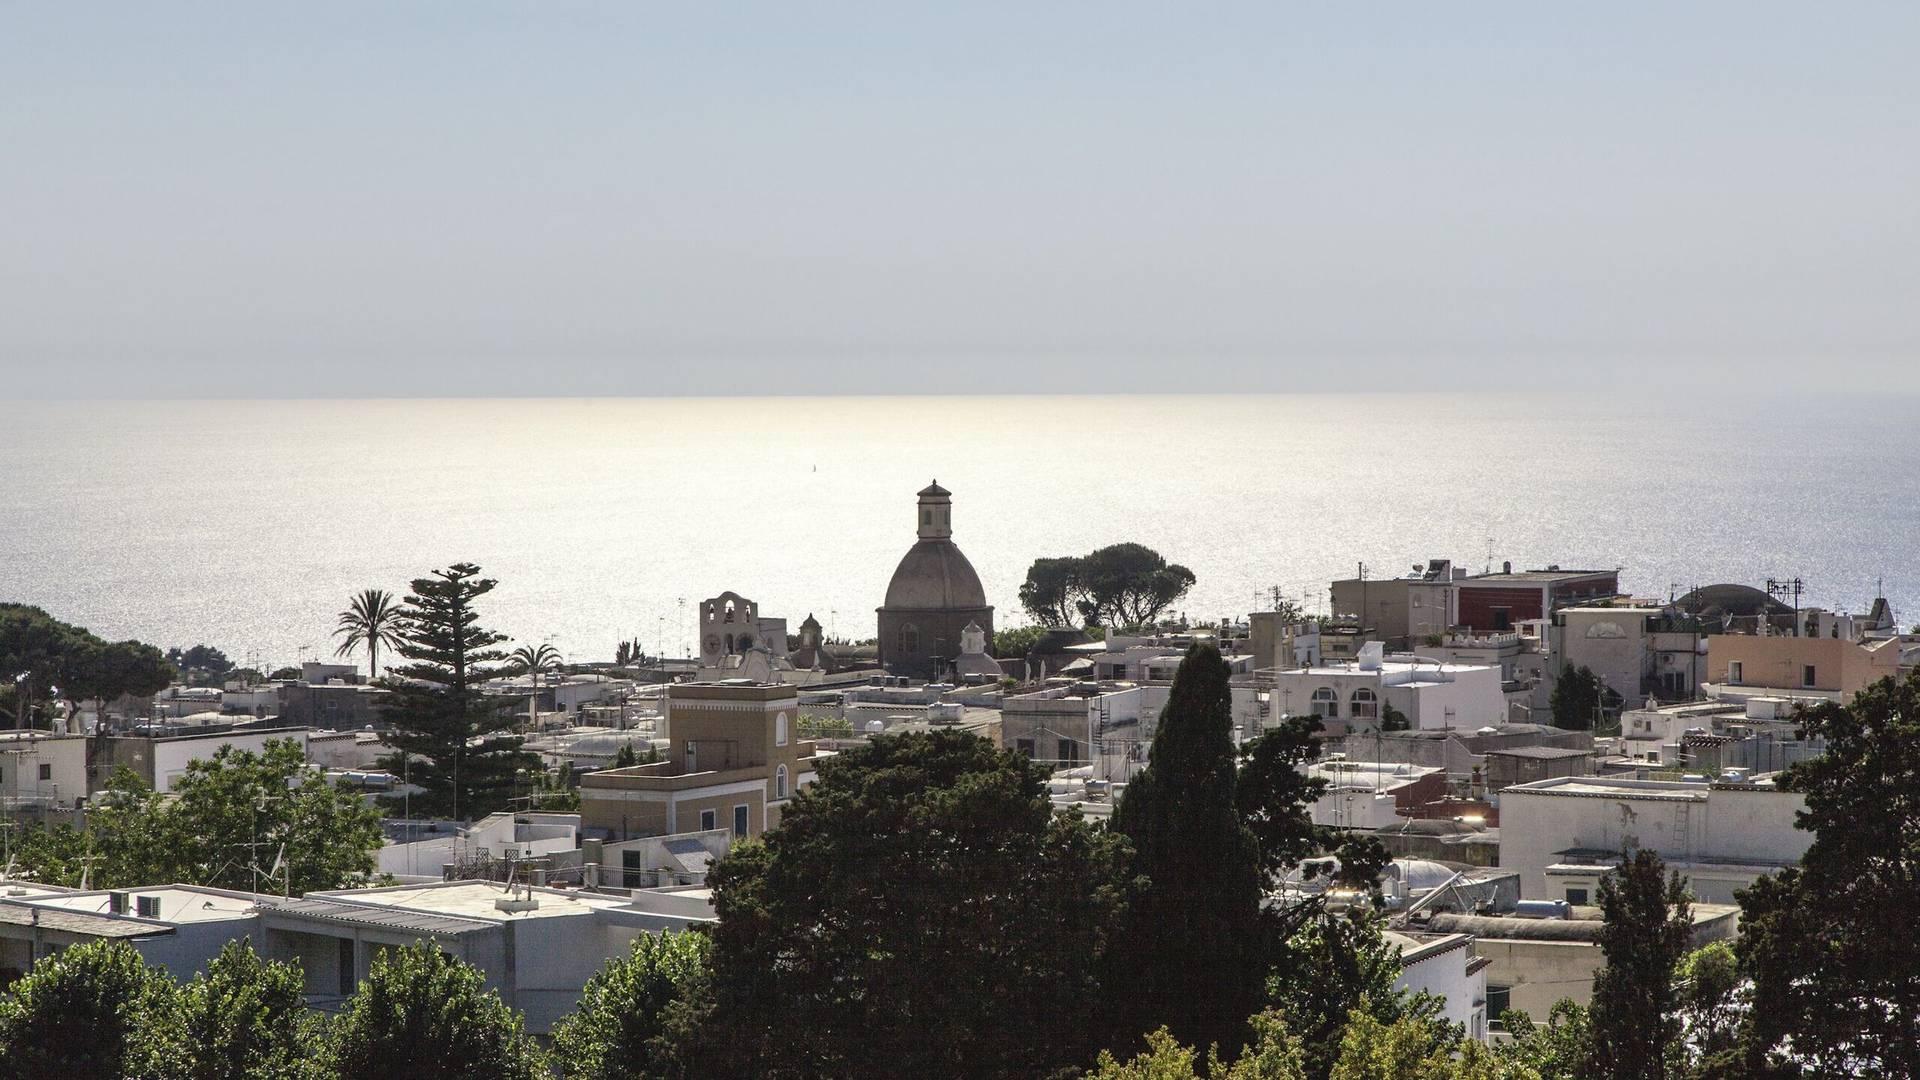 The skyline of Anacapri